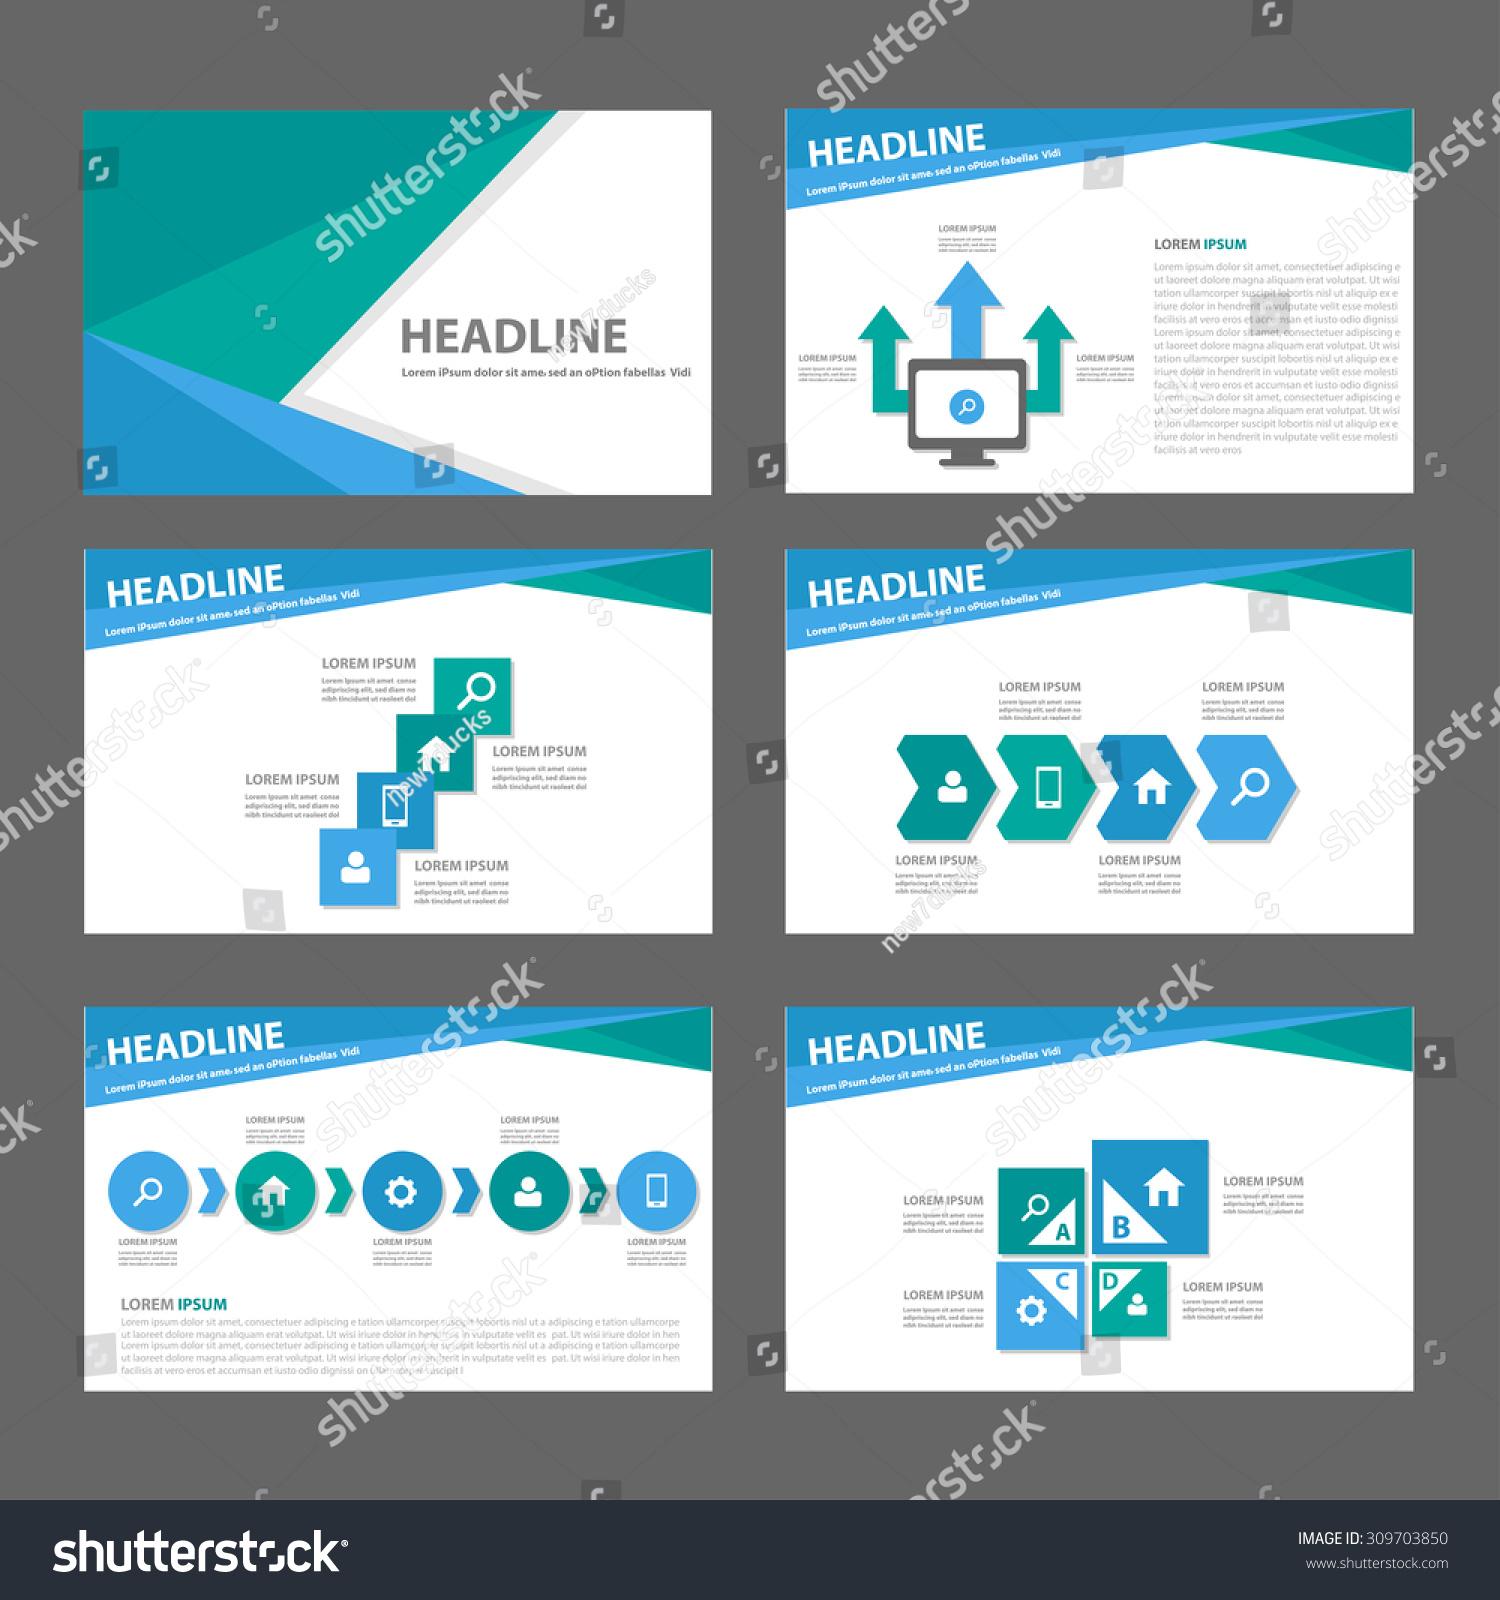 green blue multipurpose infographic presentation template stock, Presentation templates